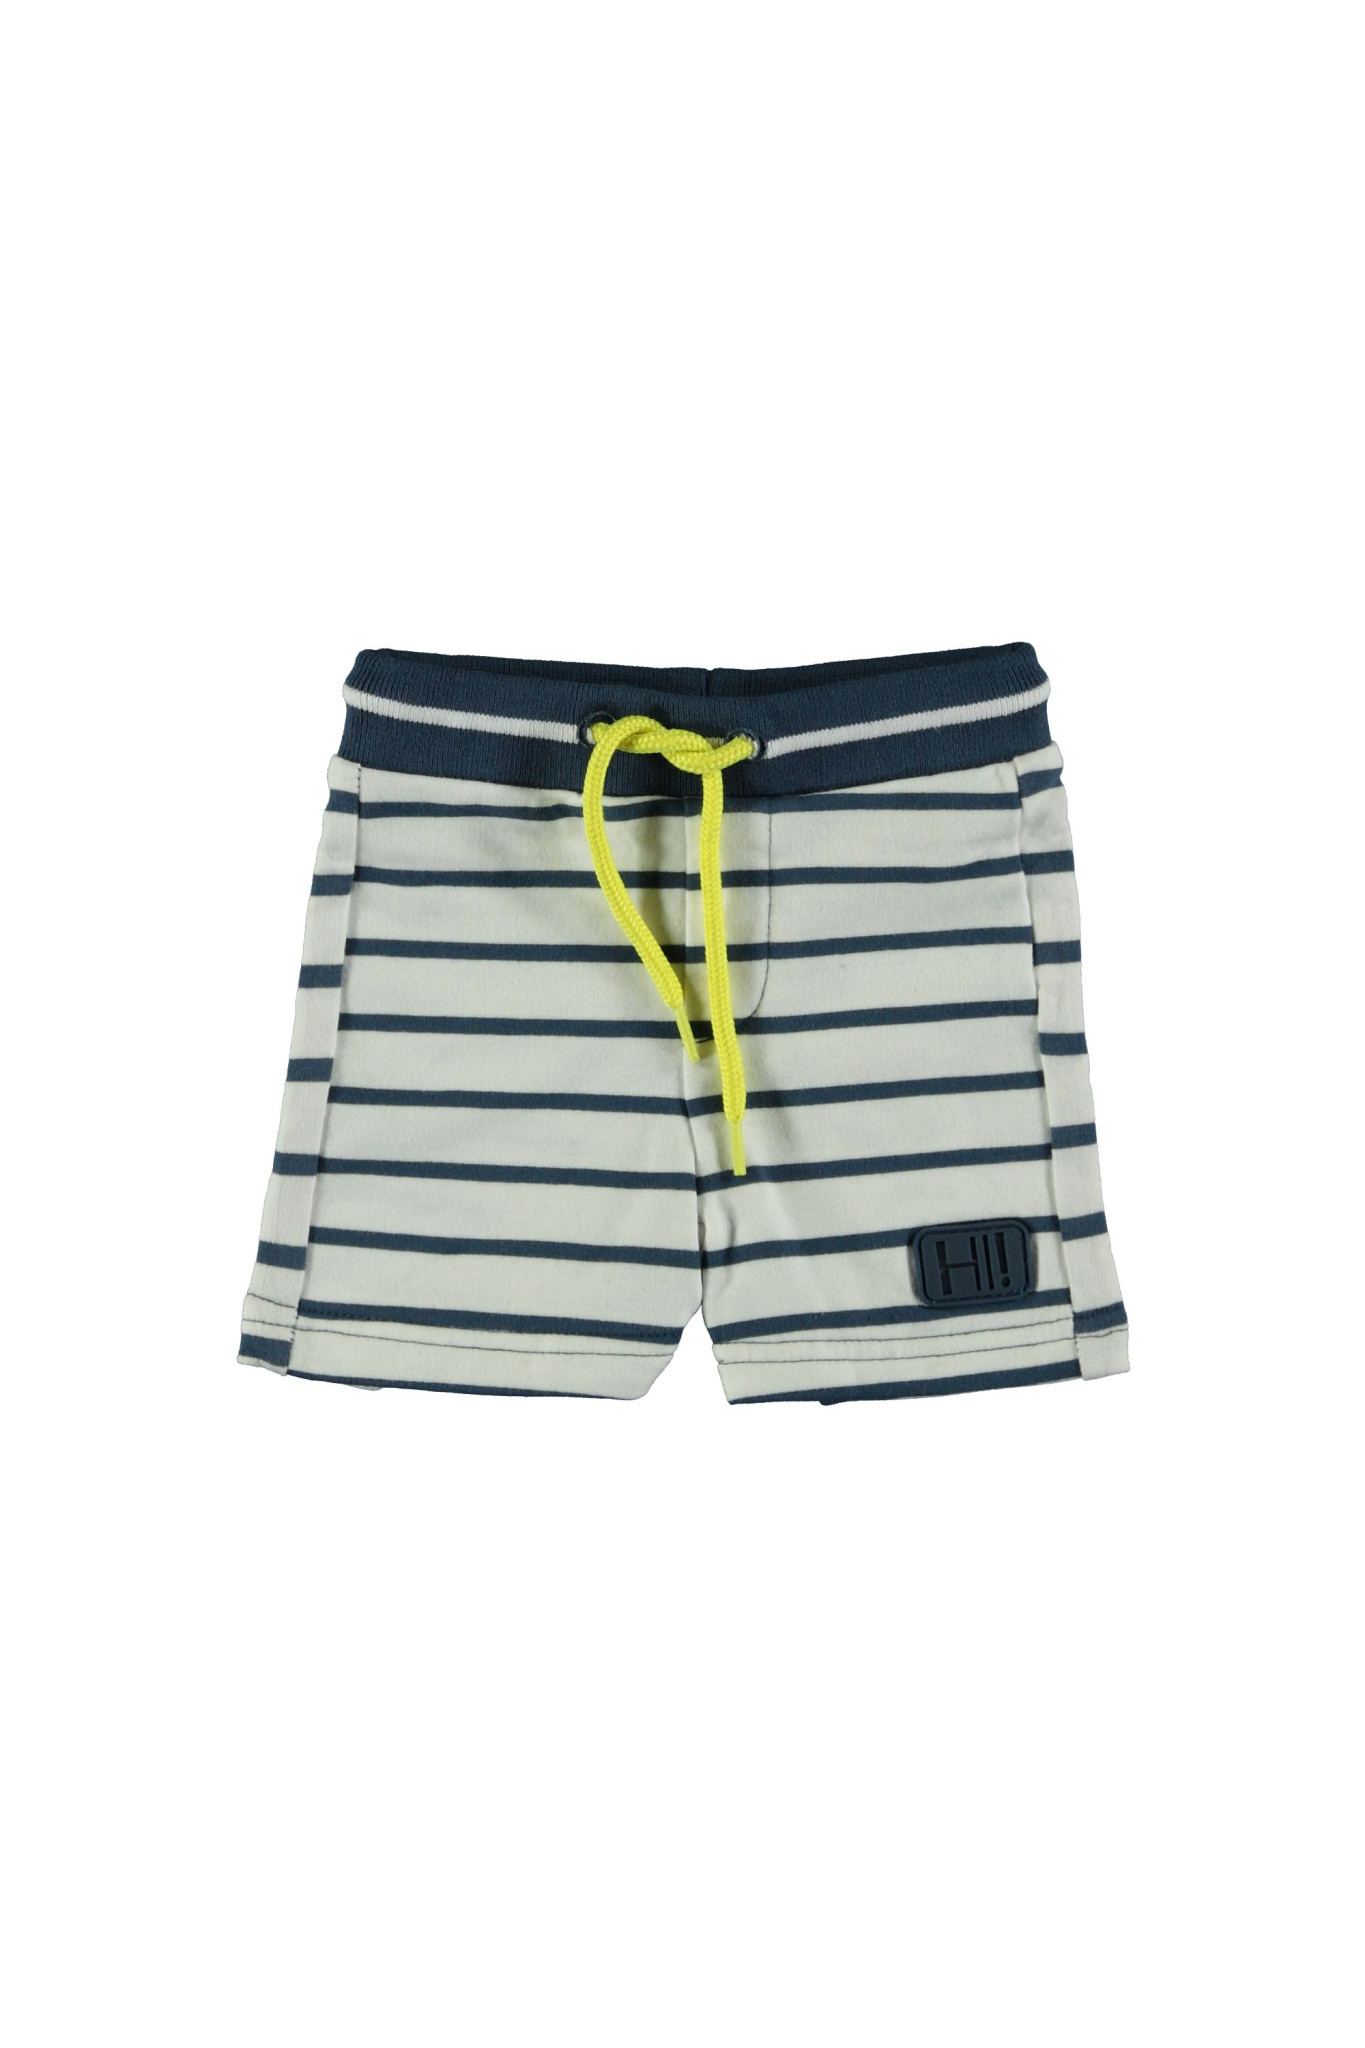 Bampidano Bampidano short y/d stripe navy